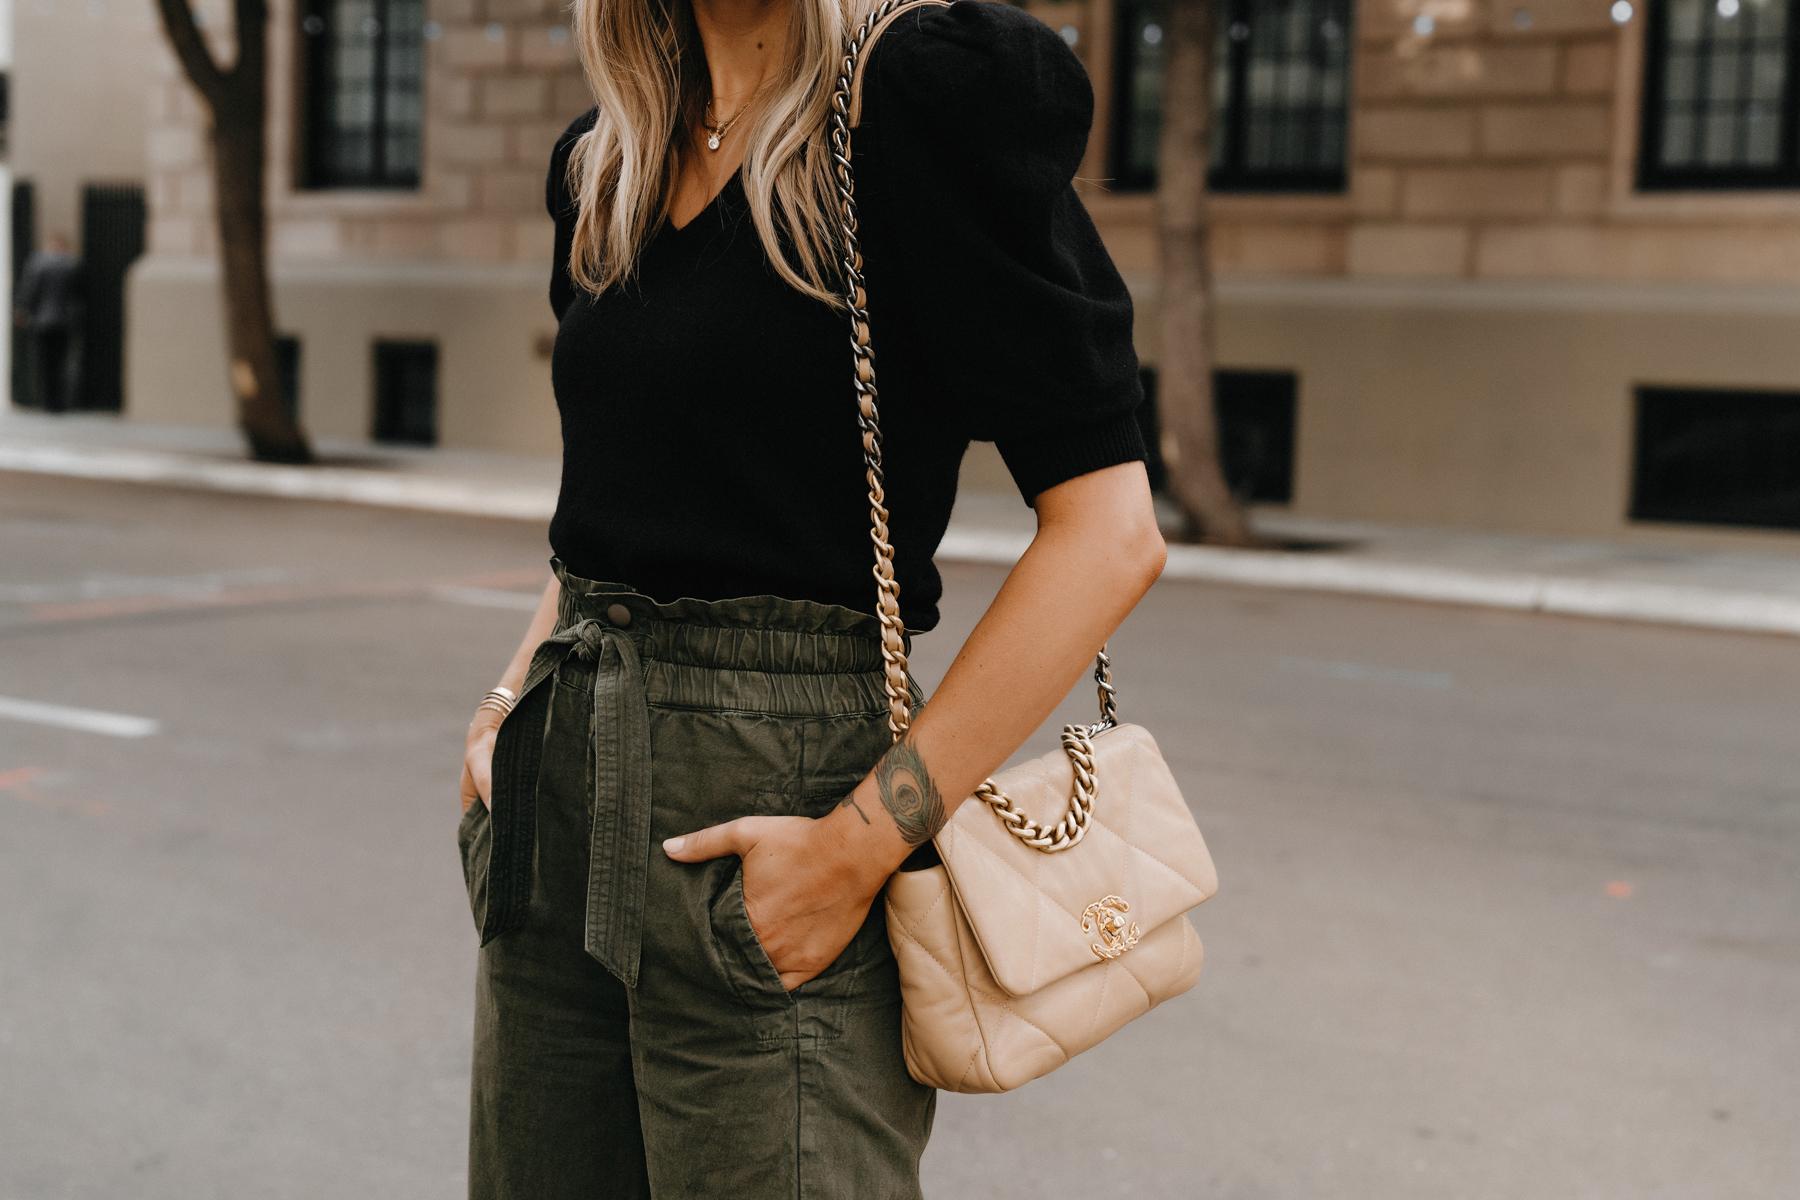 Fashion Jackson Wearing Black Puff Sleeve Sweater Olive Green Trousers Chanel 19 Beige Handbag